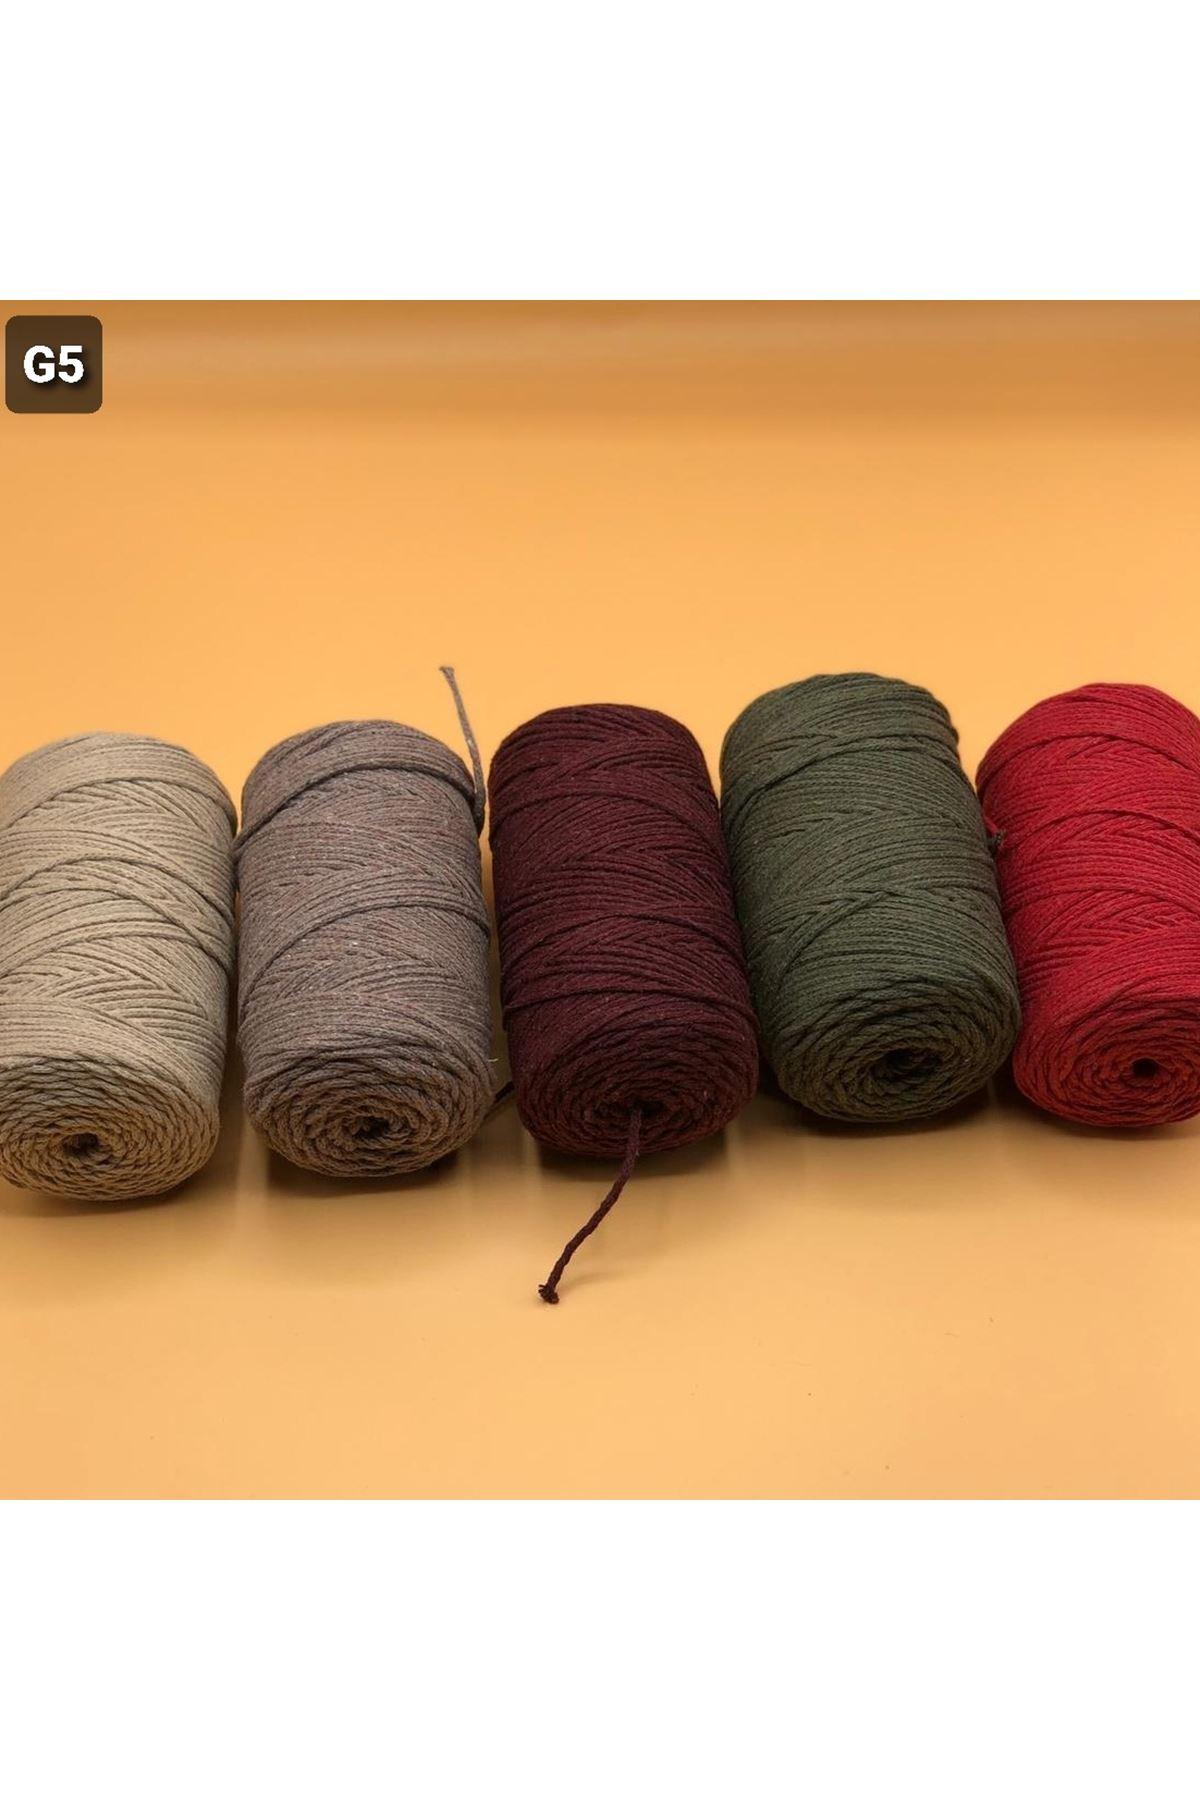 Cotton Makrome MIX Paket 1270 gram Grup 5